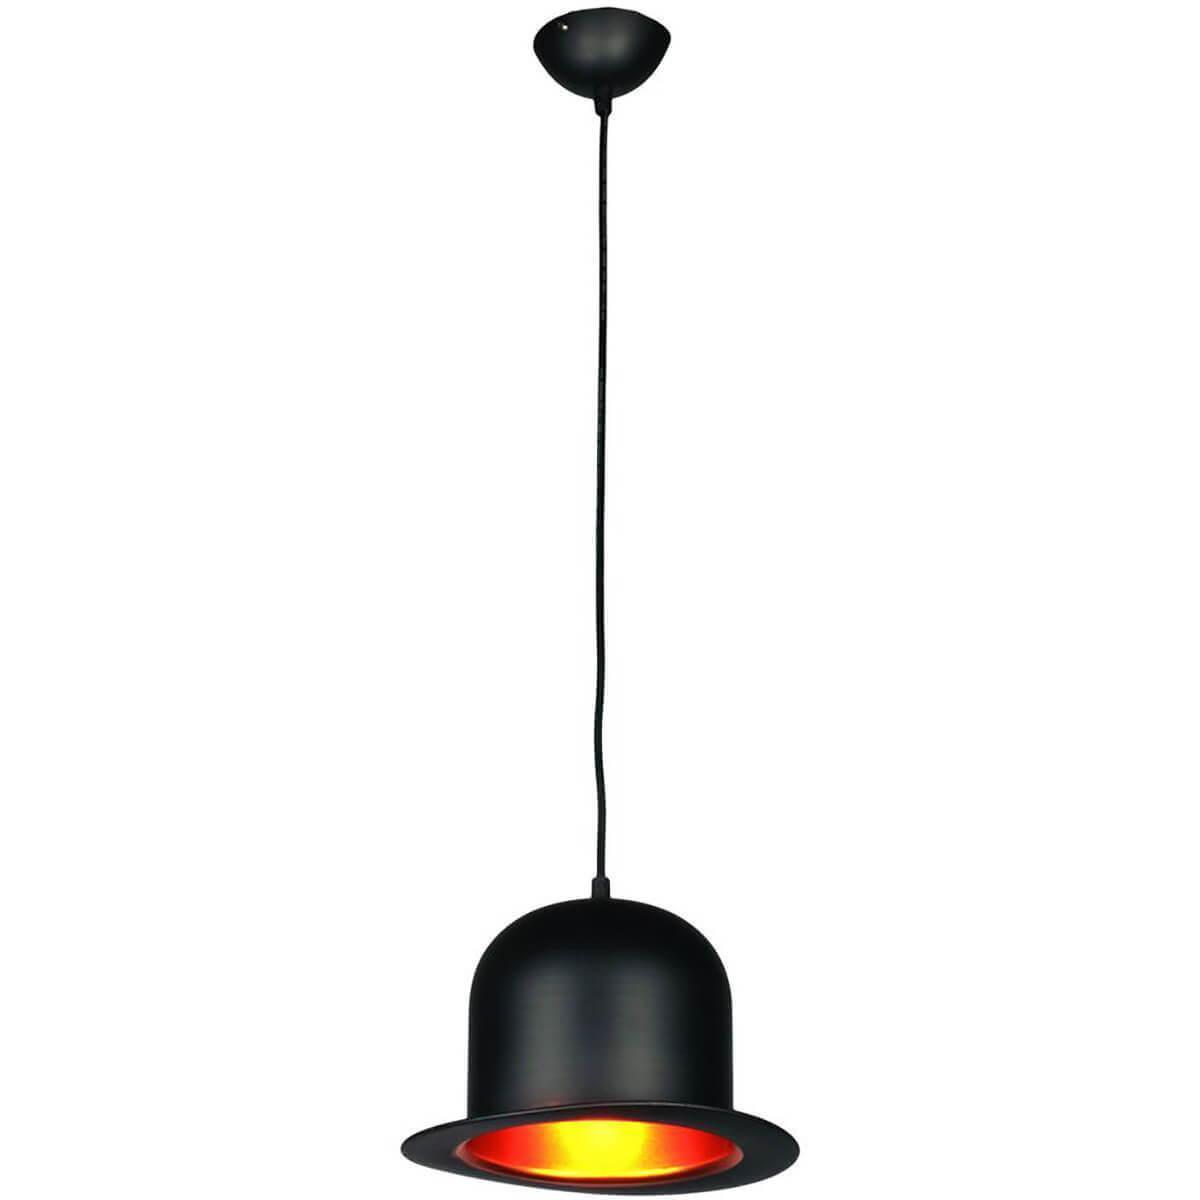 Подвесной светильник Omnilux OML-34606-01, E27, 40 Вт